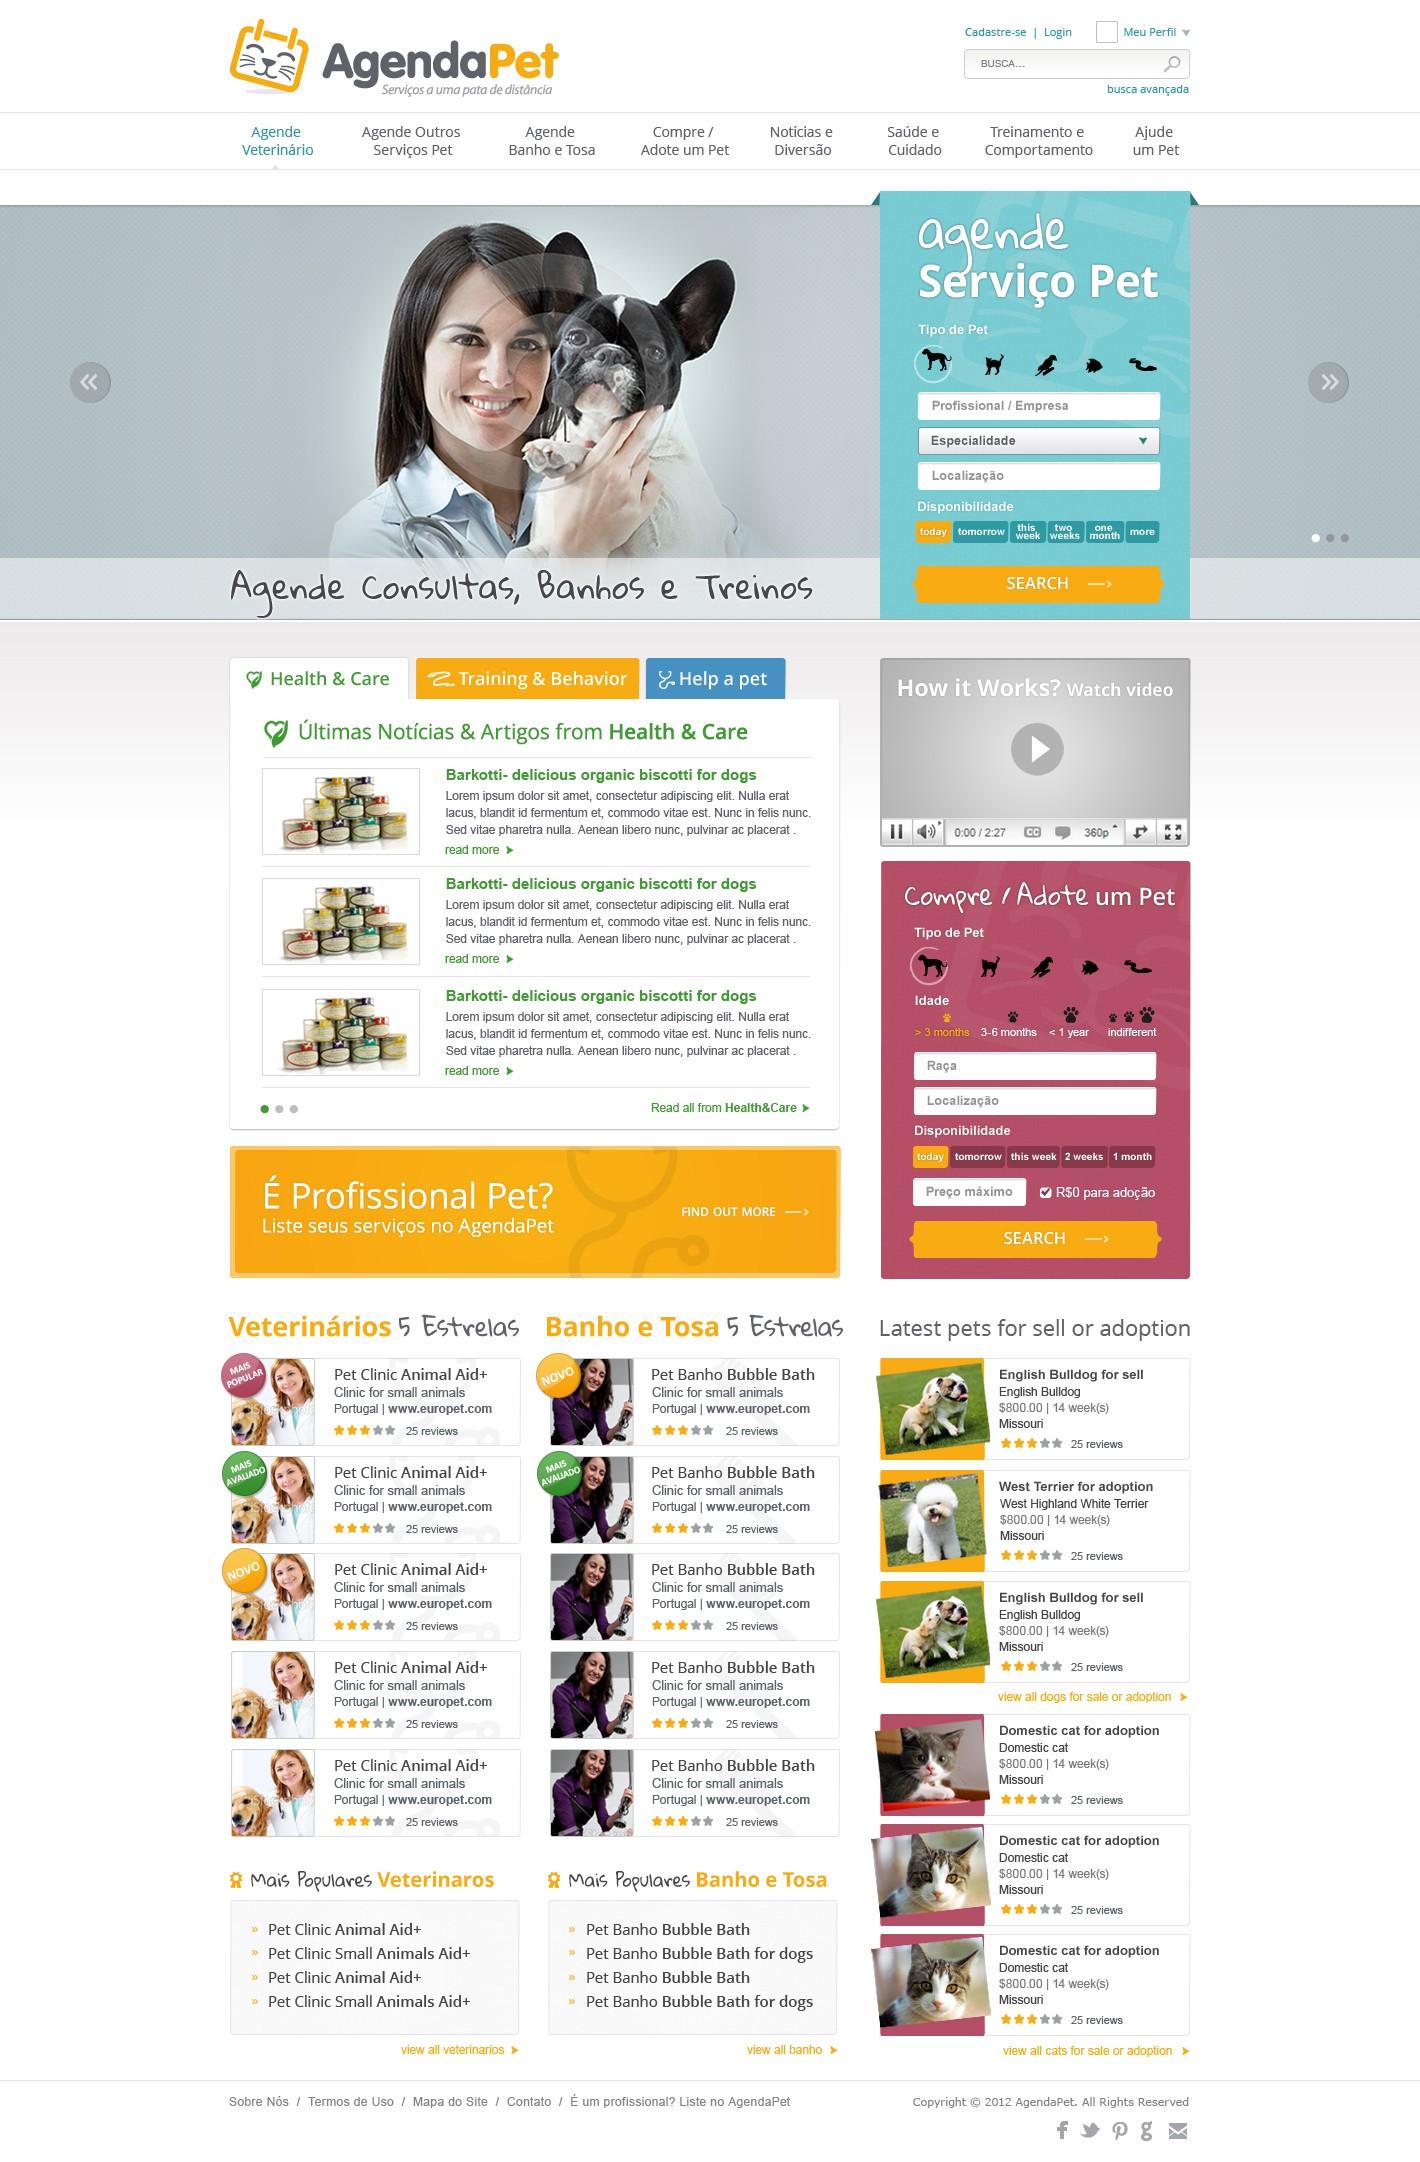 New website design wanted for AgendaPet